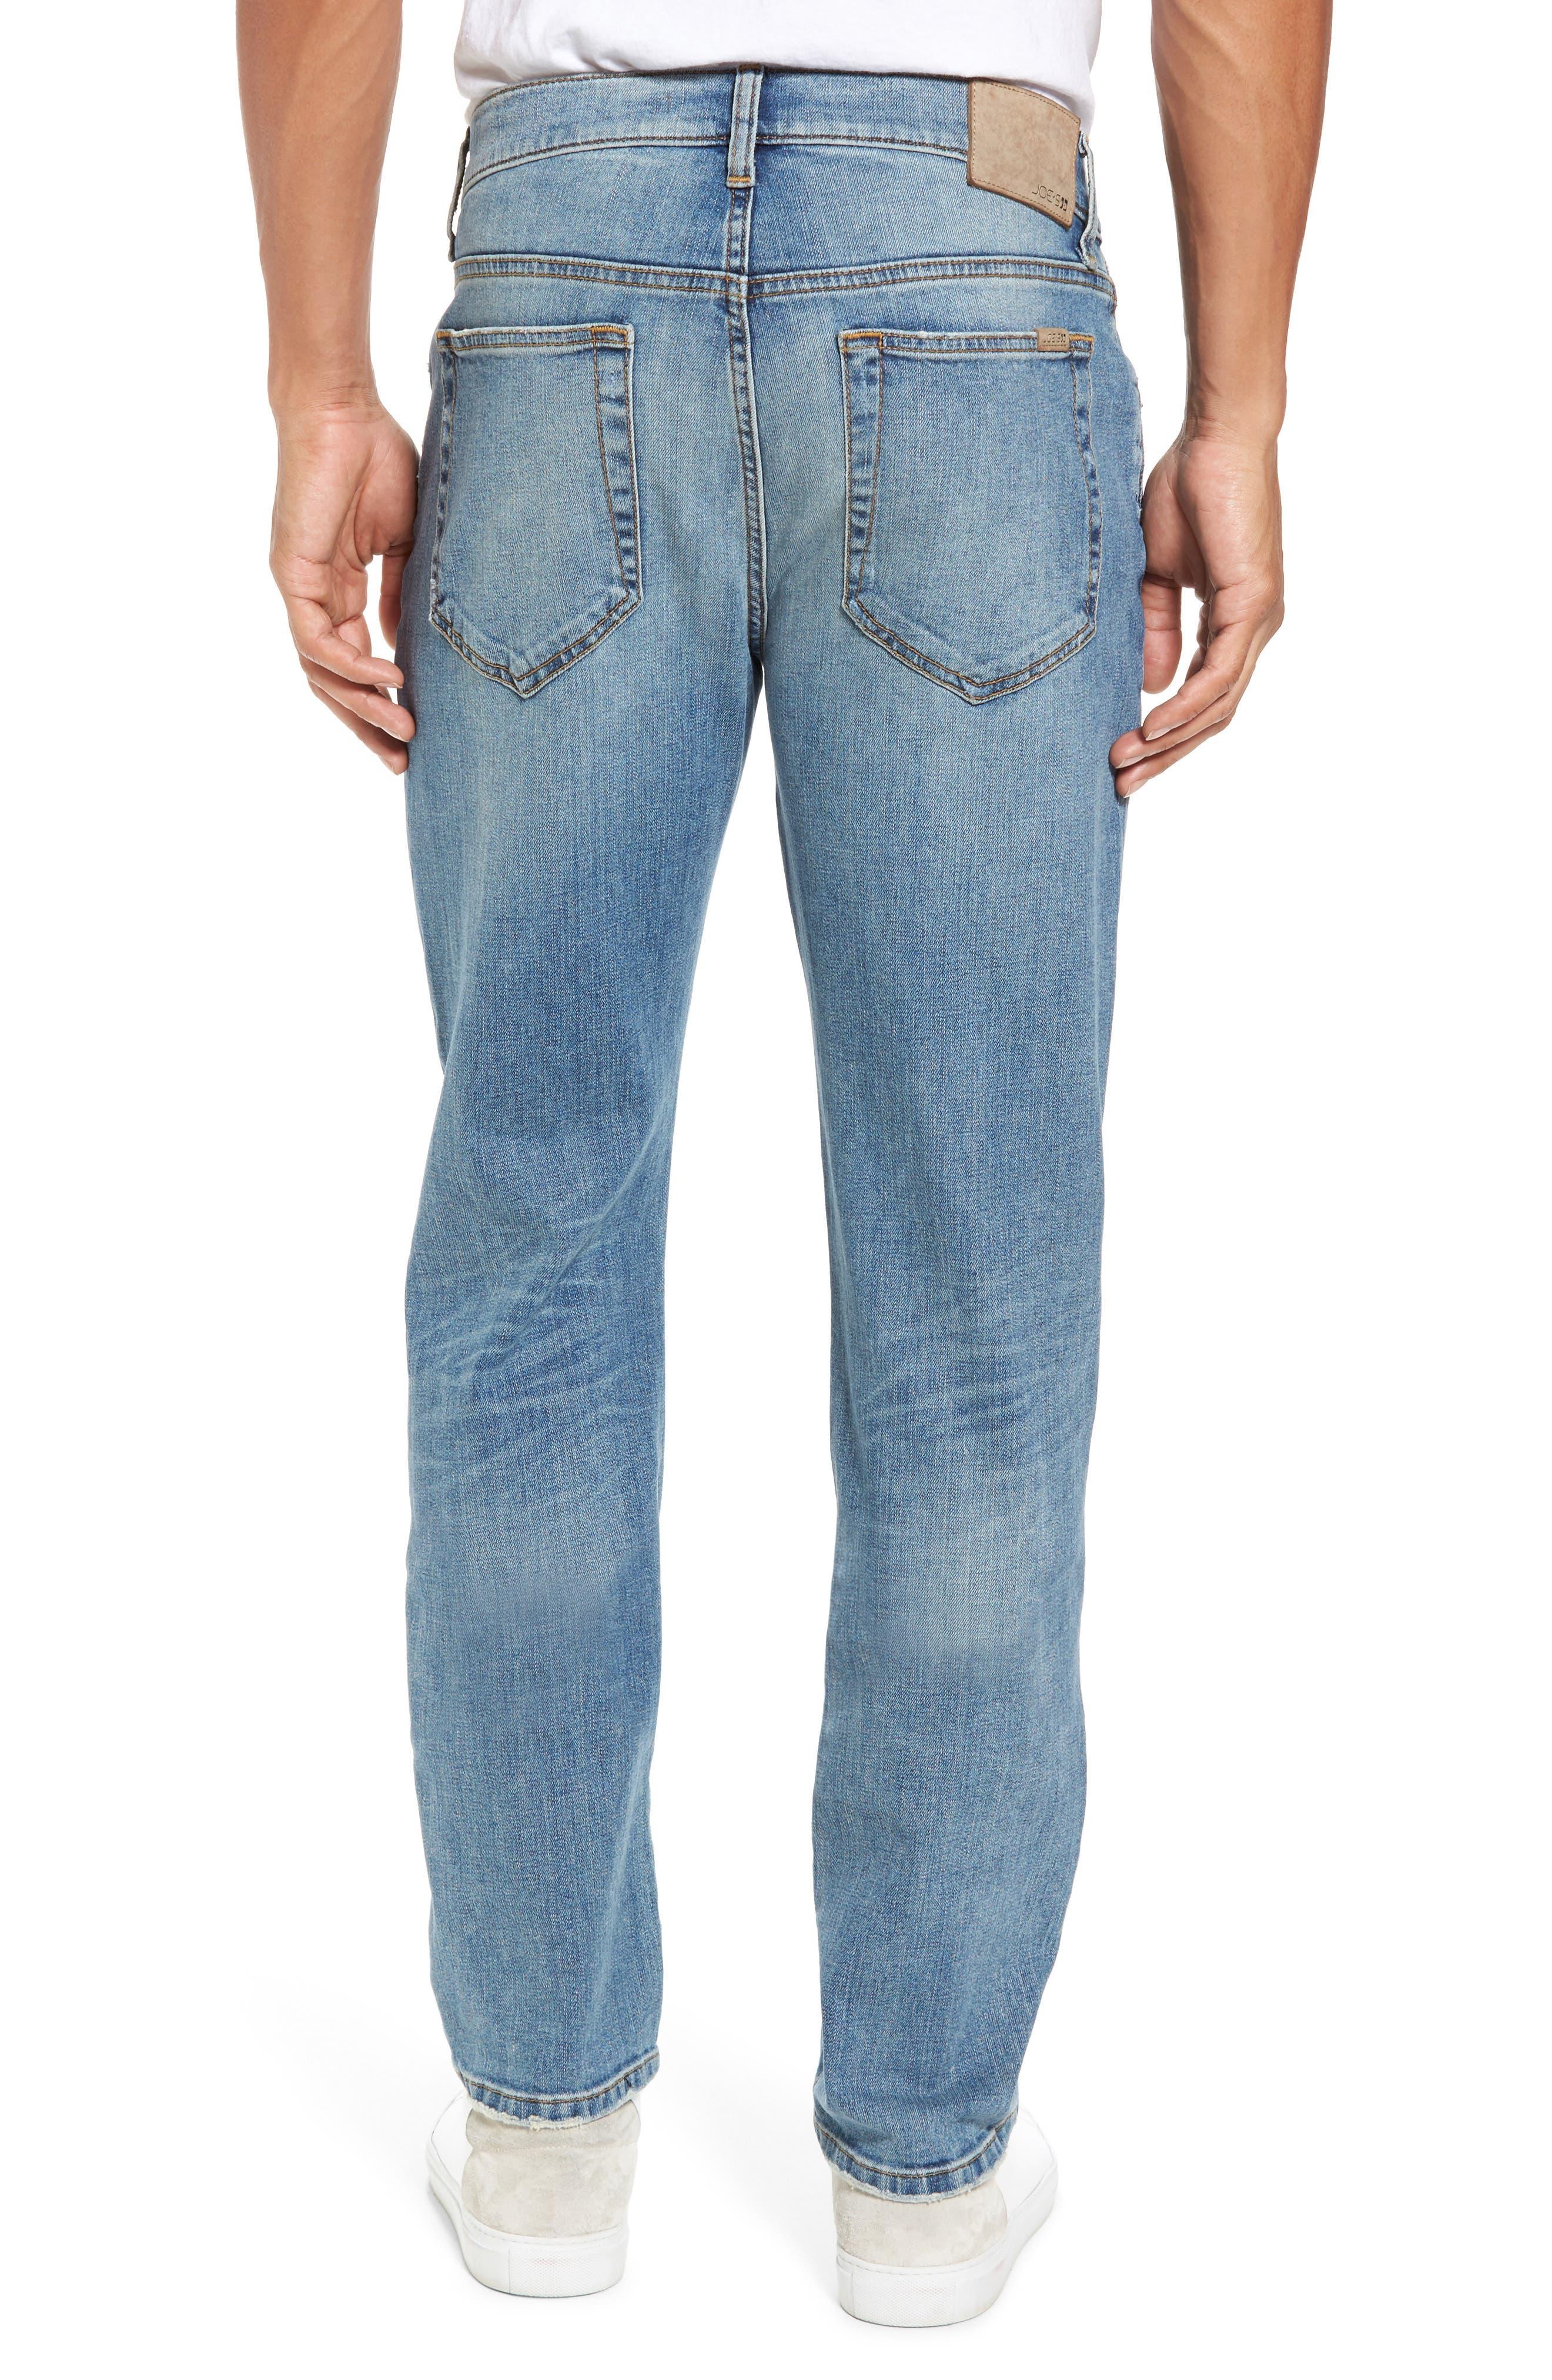 Brixton Slim Straight Fit Jeans,                             Alternate thumbnail 2, color,                             475